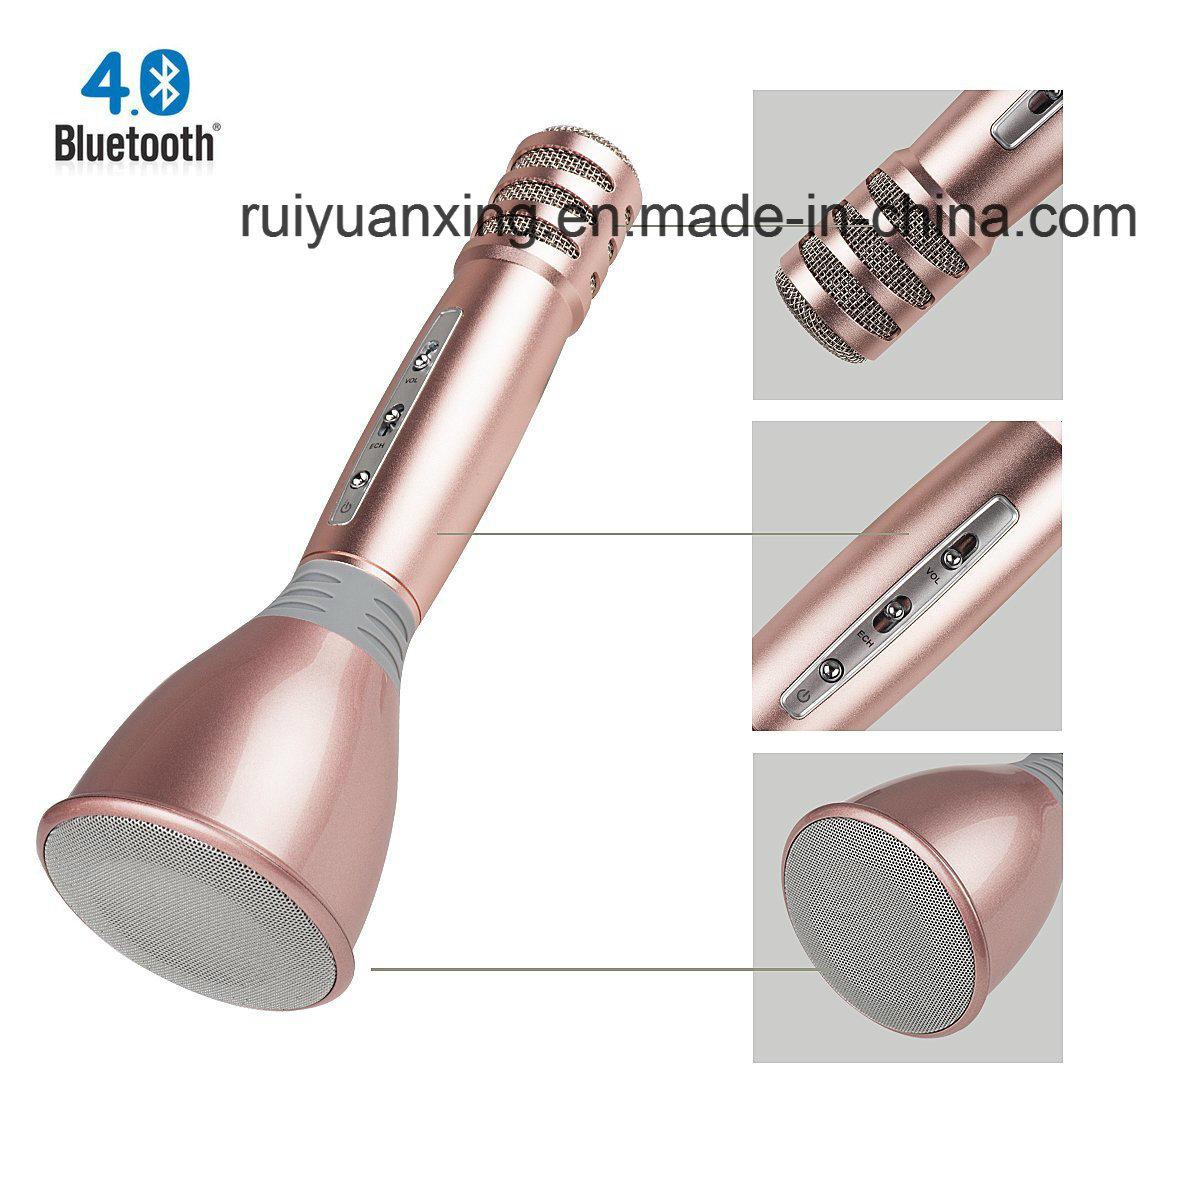 Wireless Microphones Karaoke, 3-in-1 Bluetooth Karaoke machine KTV(Rose Gold)